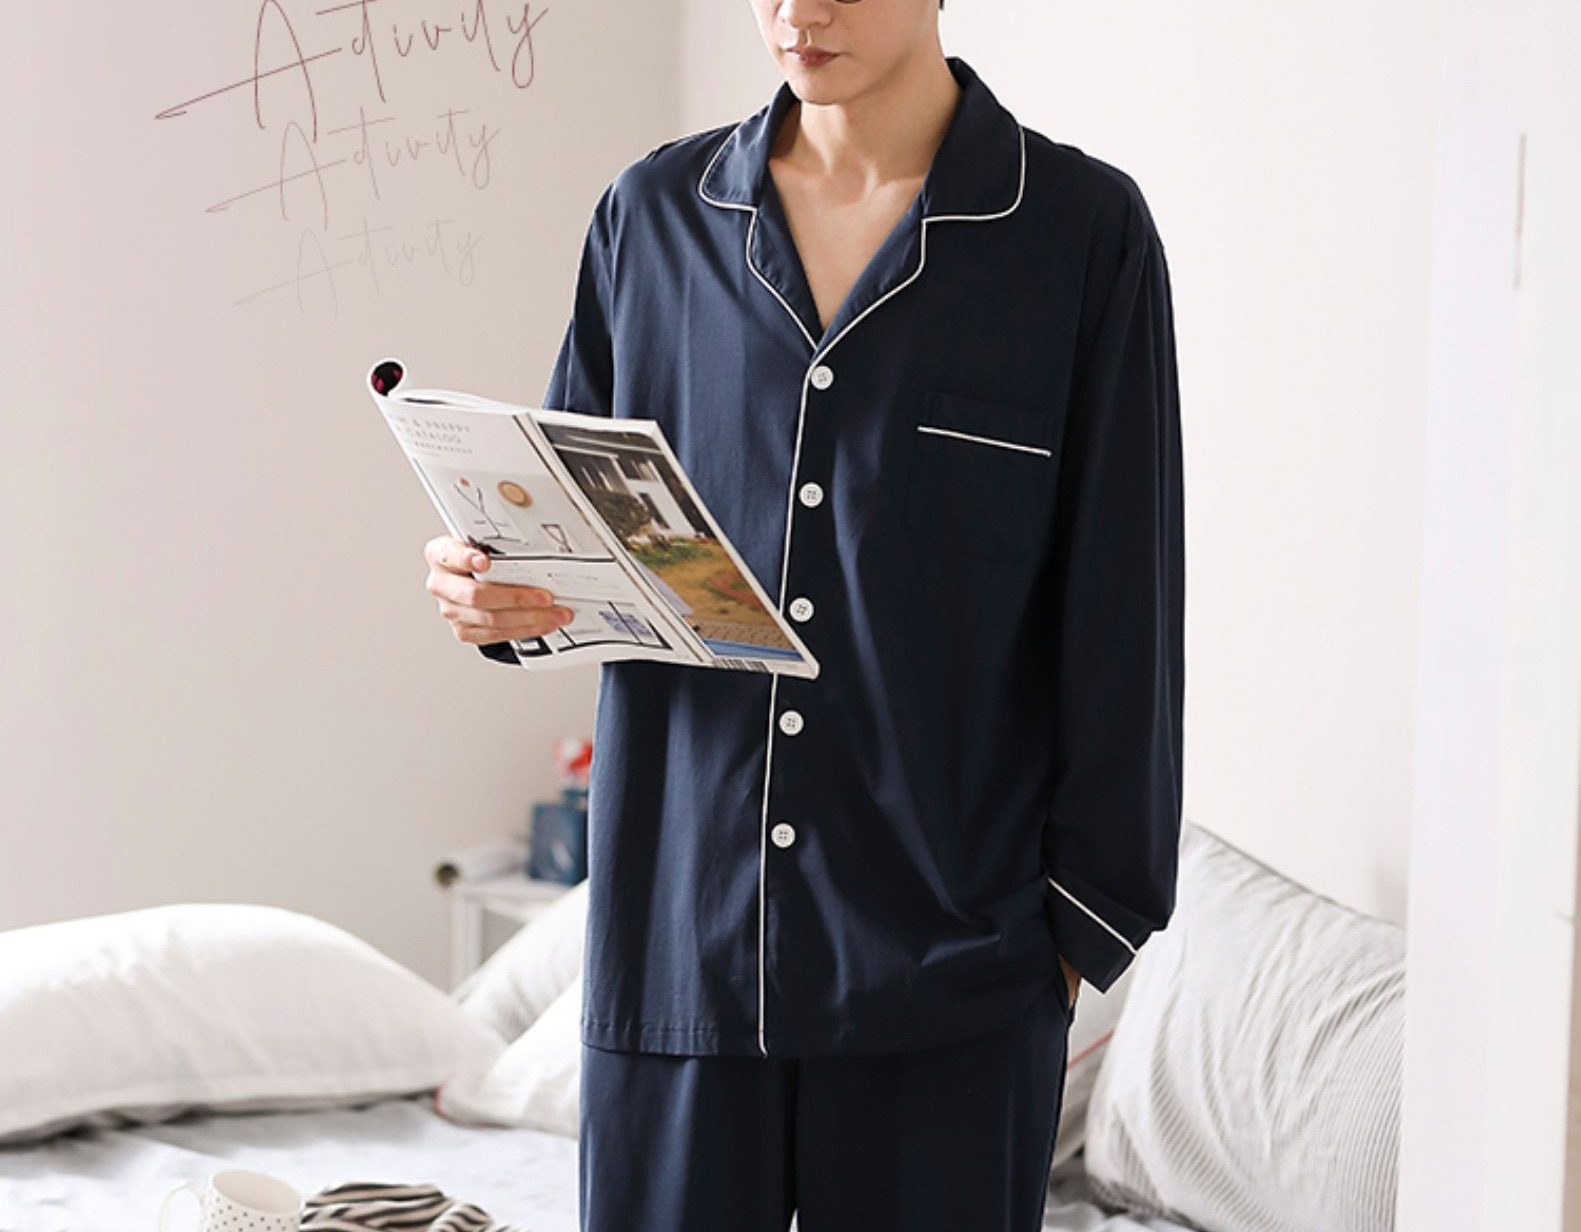 2021 Japanese Style Men's Pajamas Comfortable 100% Cotton Comfortable Lapel Shirt Long Sleeve Pajamas SetcottonWorsted